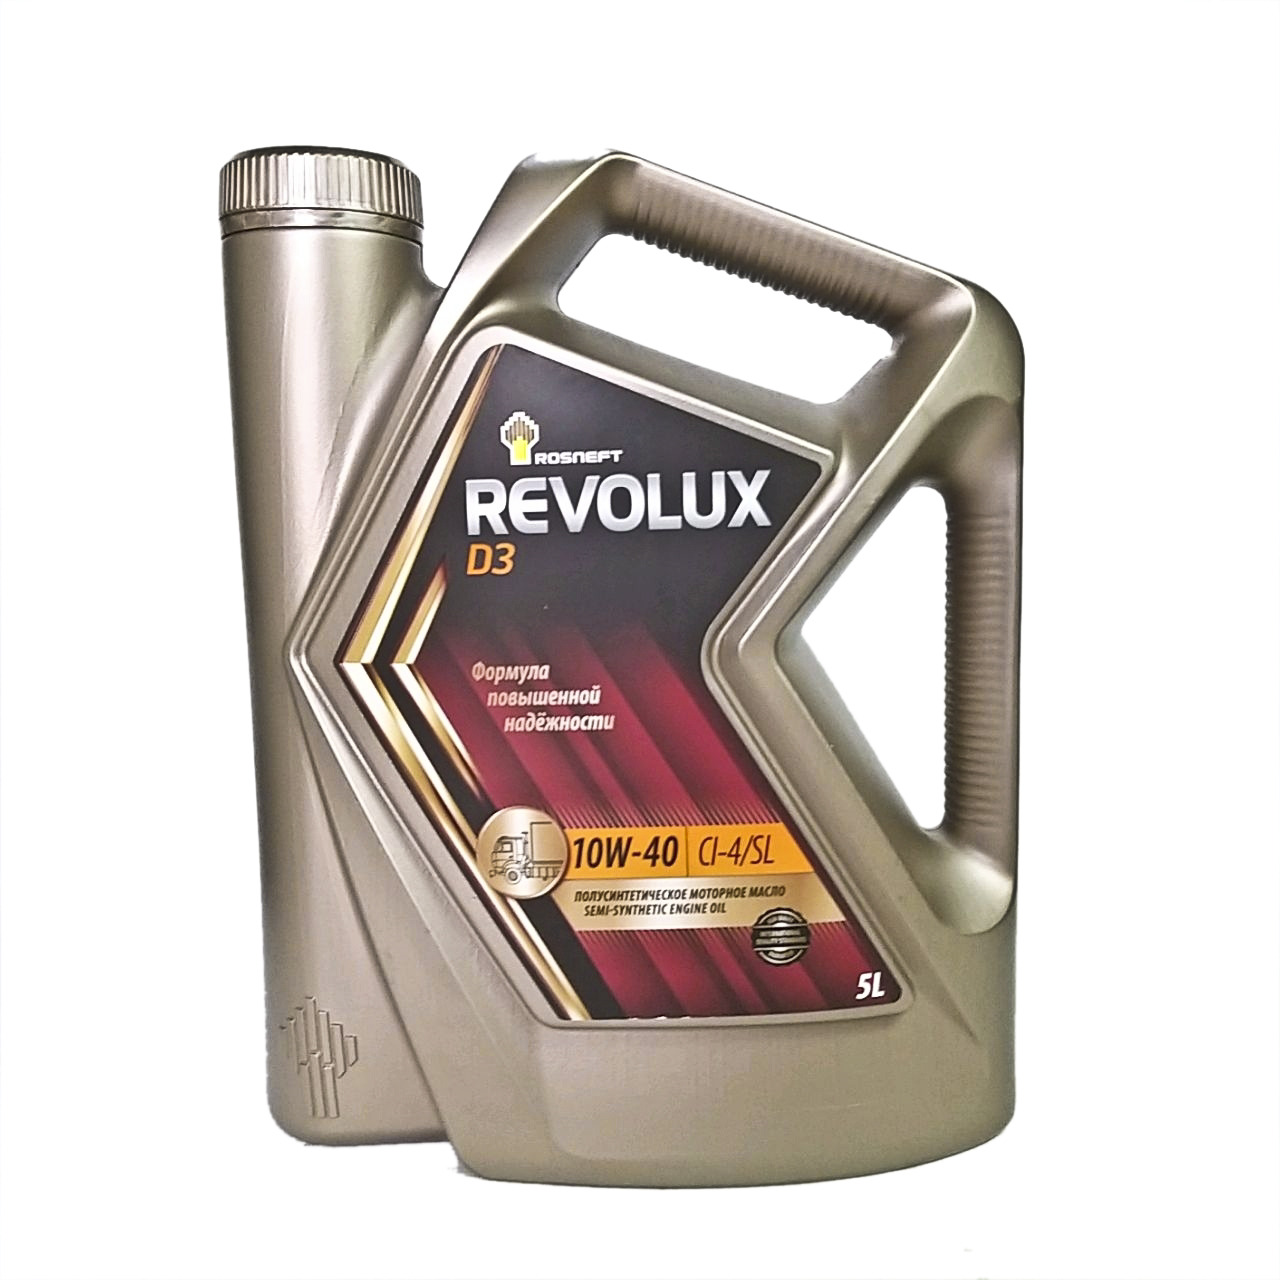 Rosneft Revolux D3 10w-40 (5 L.)